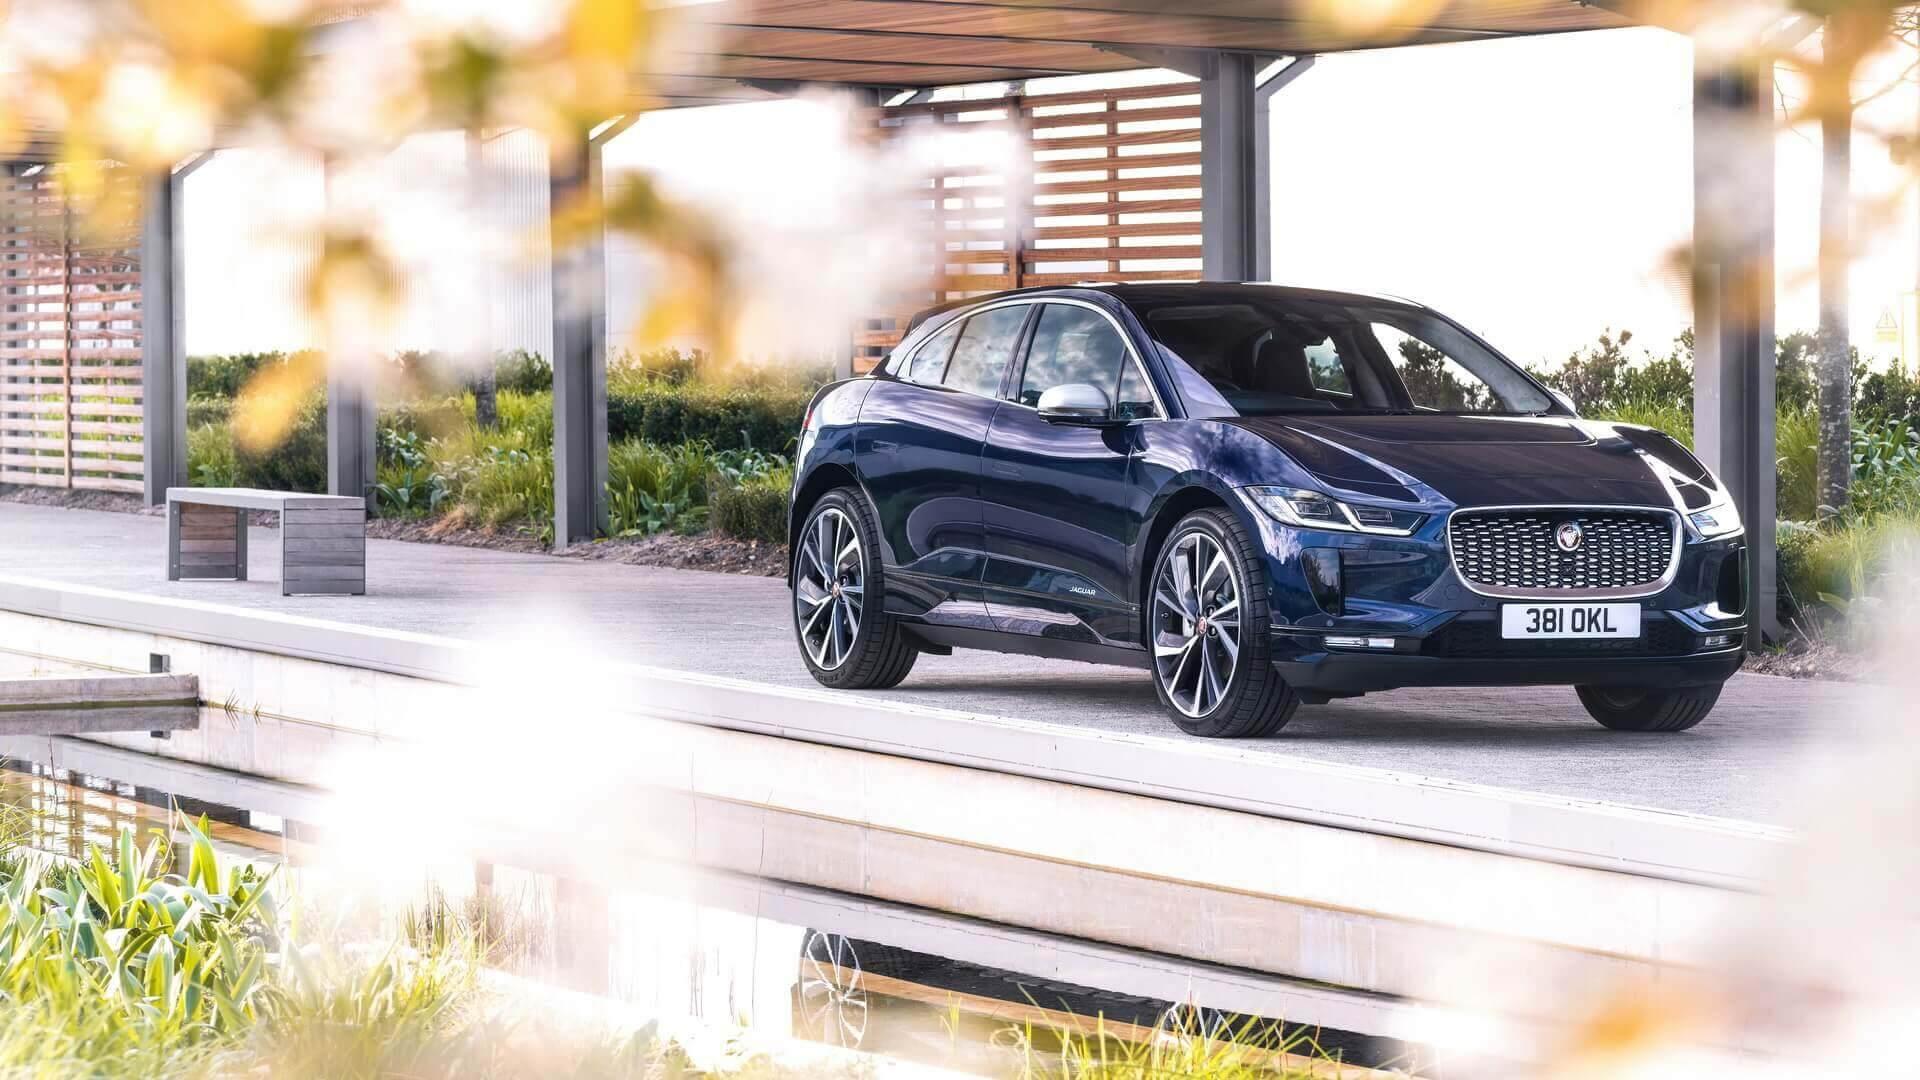 Електричний кросовер Jaguar I-PACE 2021